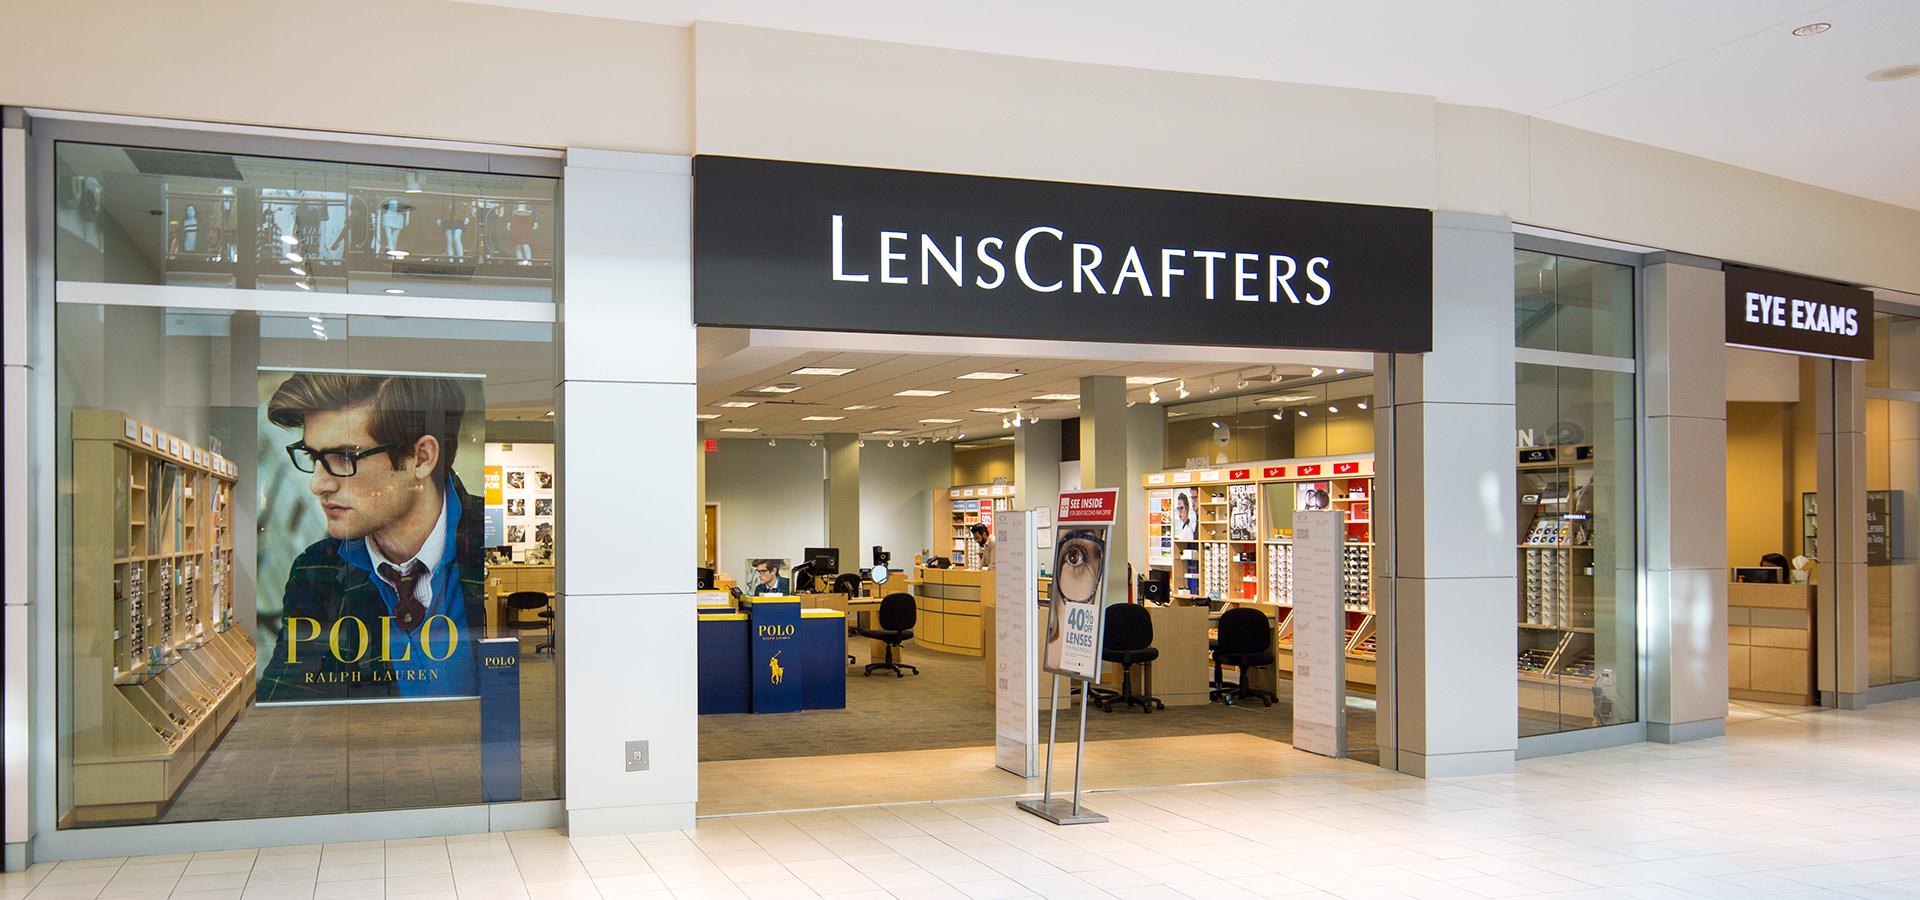 Lenscrafters - Copy.jpg